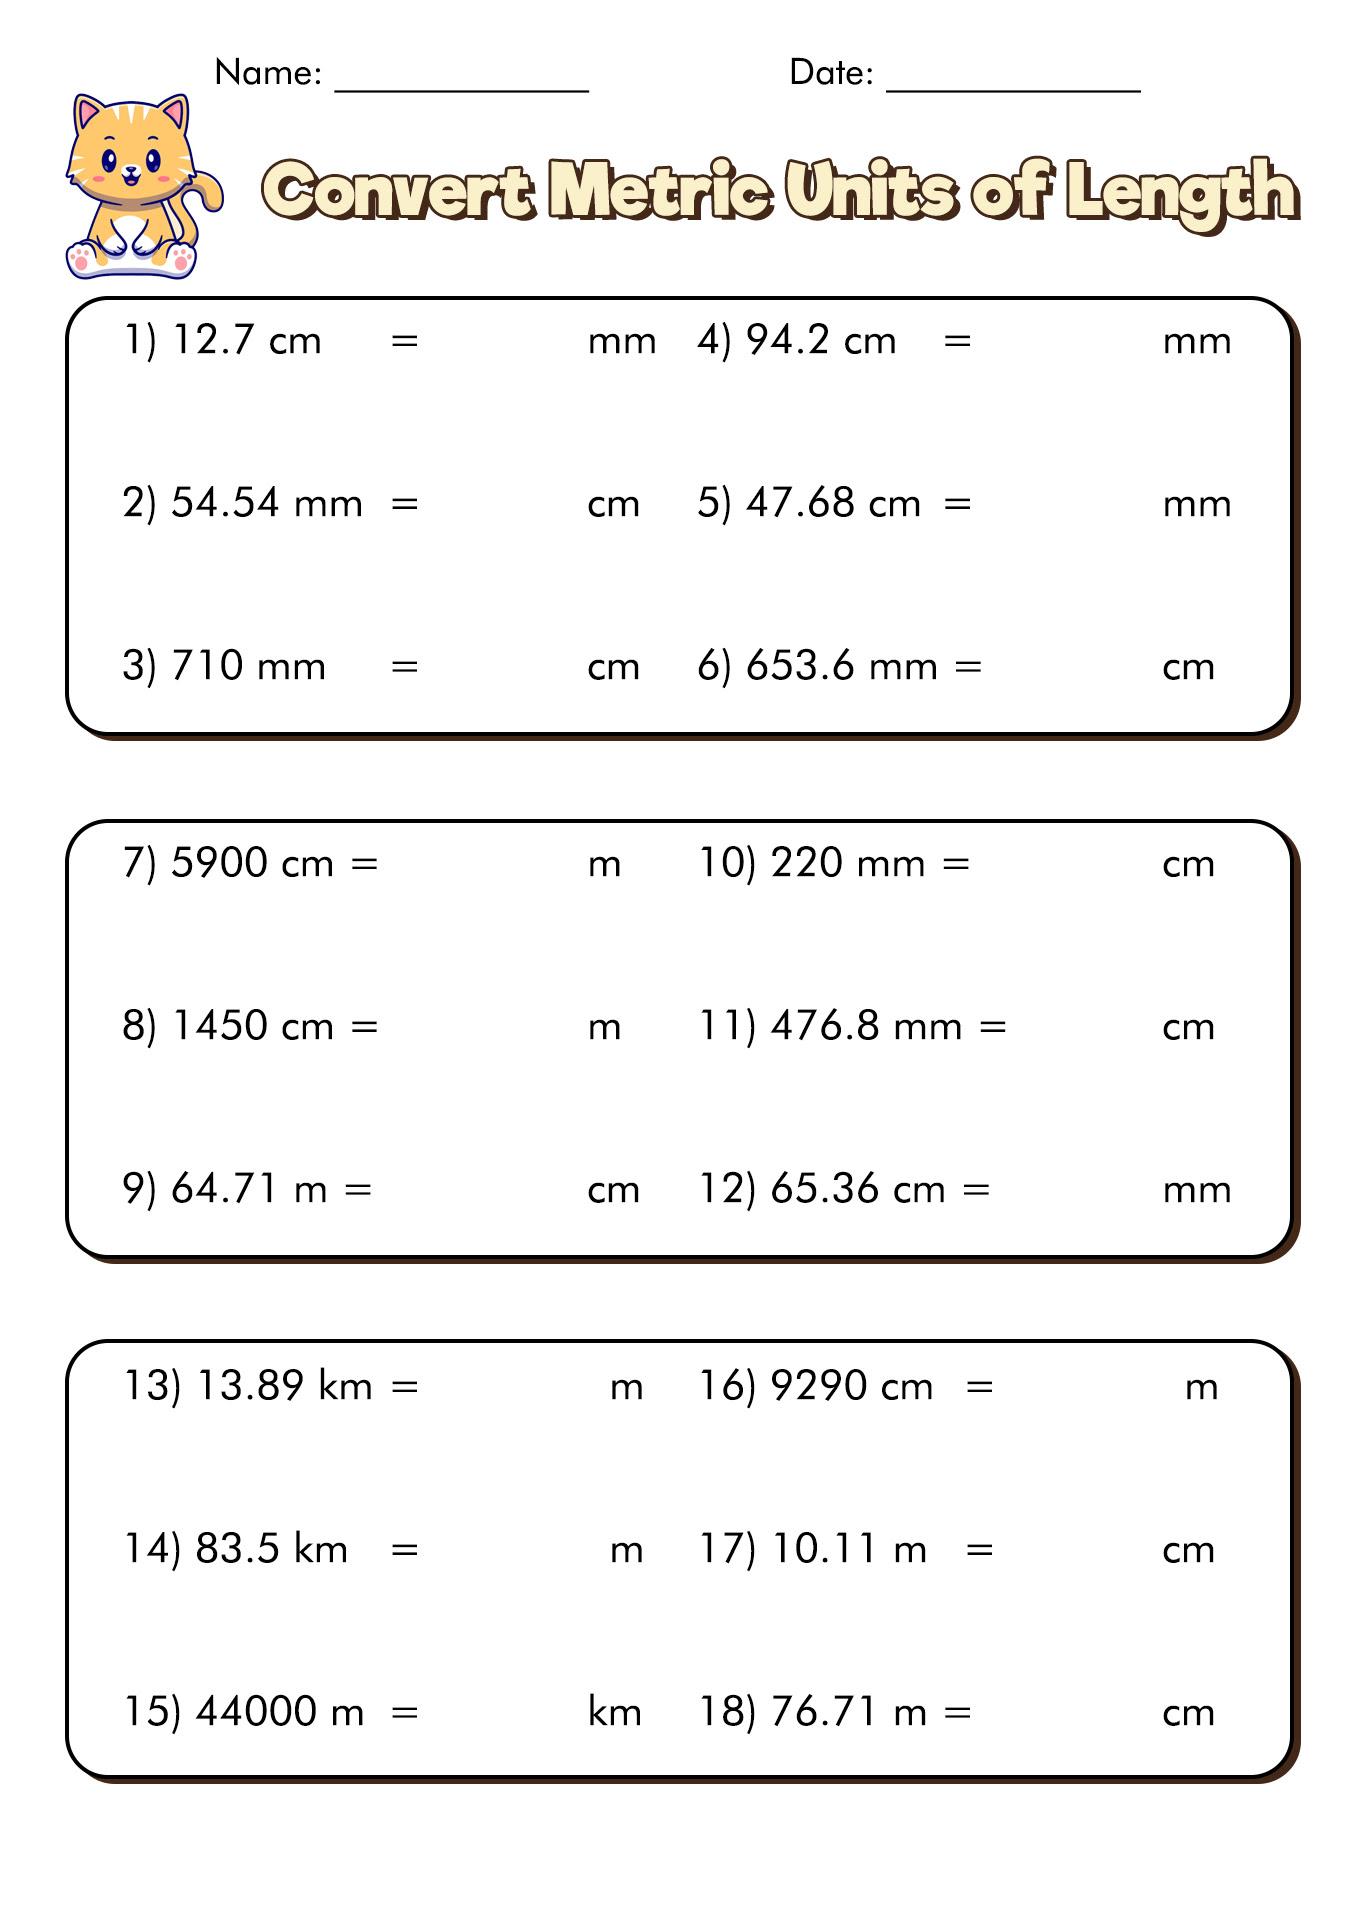 12 Best Images of Measuring Units Worksheet Answer Key  Metric Unit Conversion Worksheet